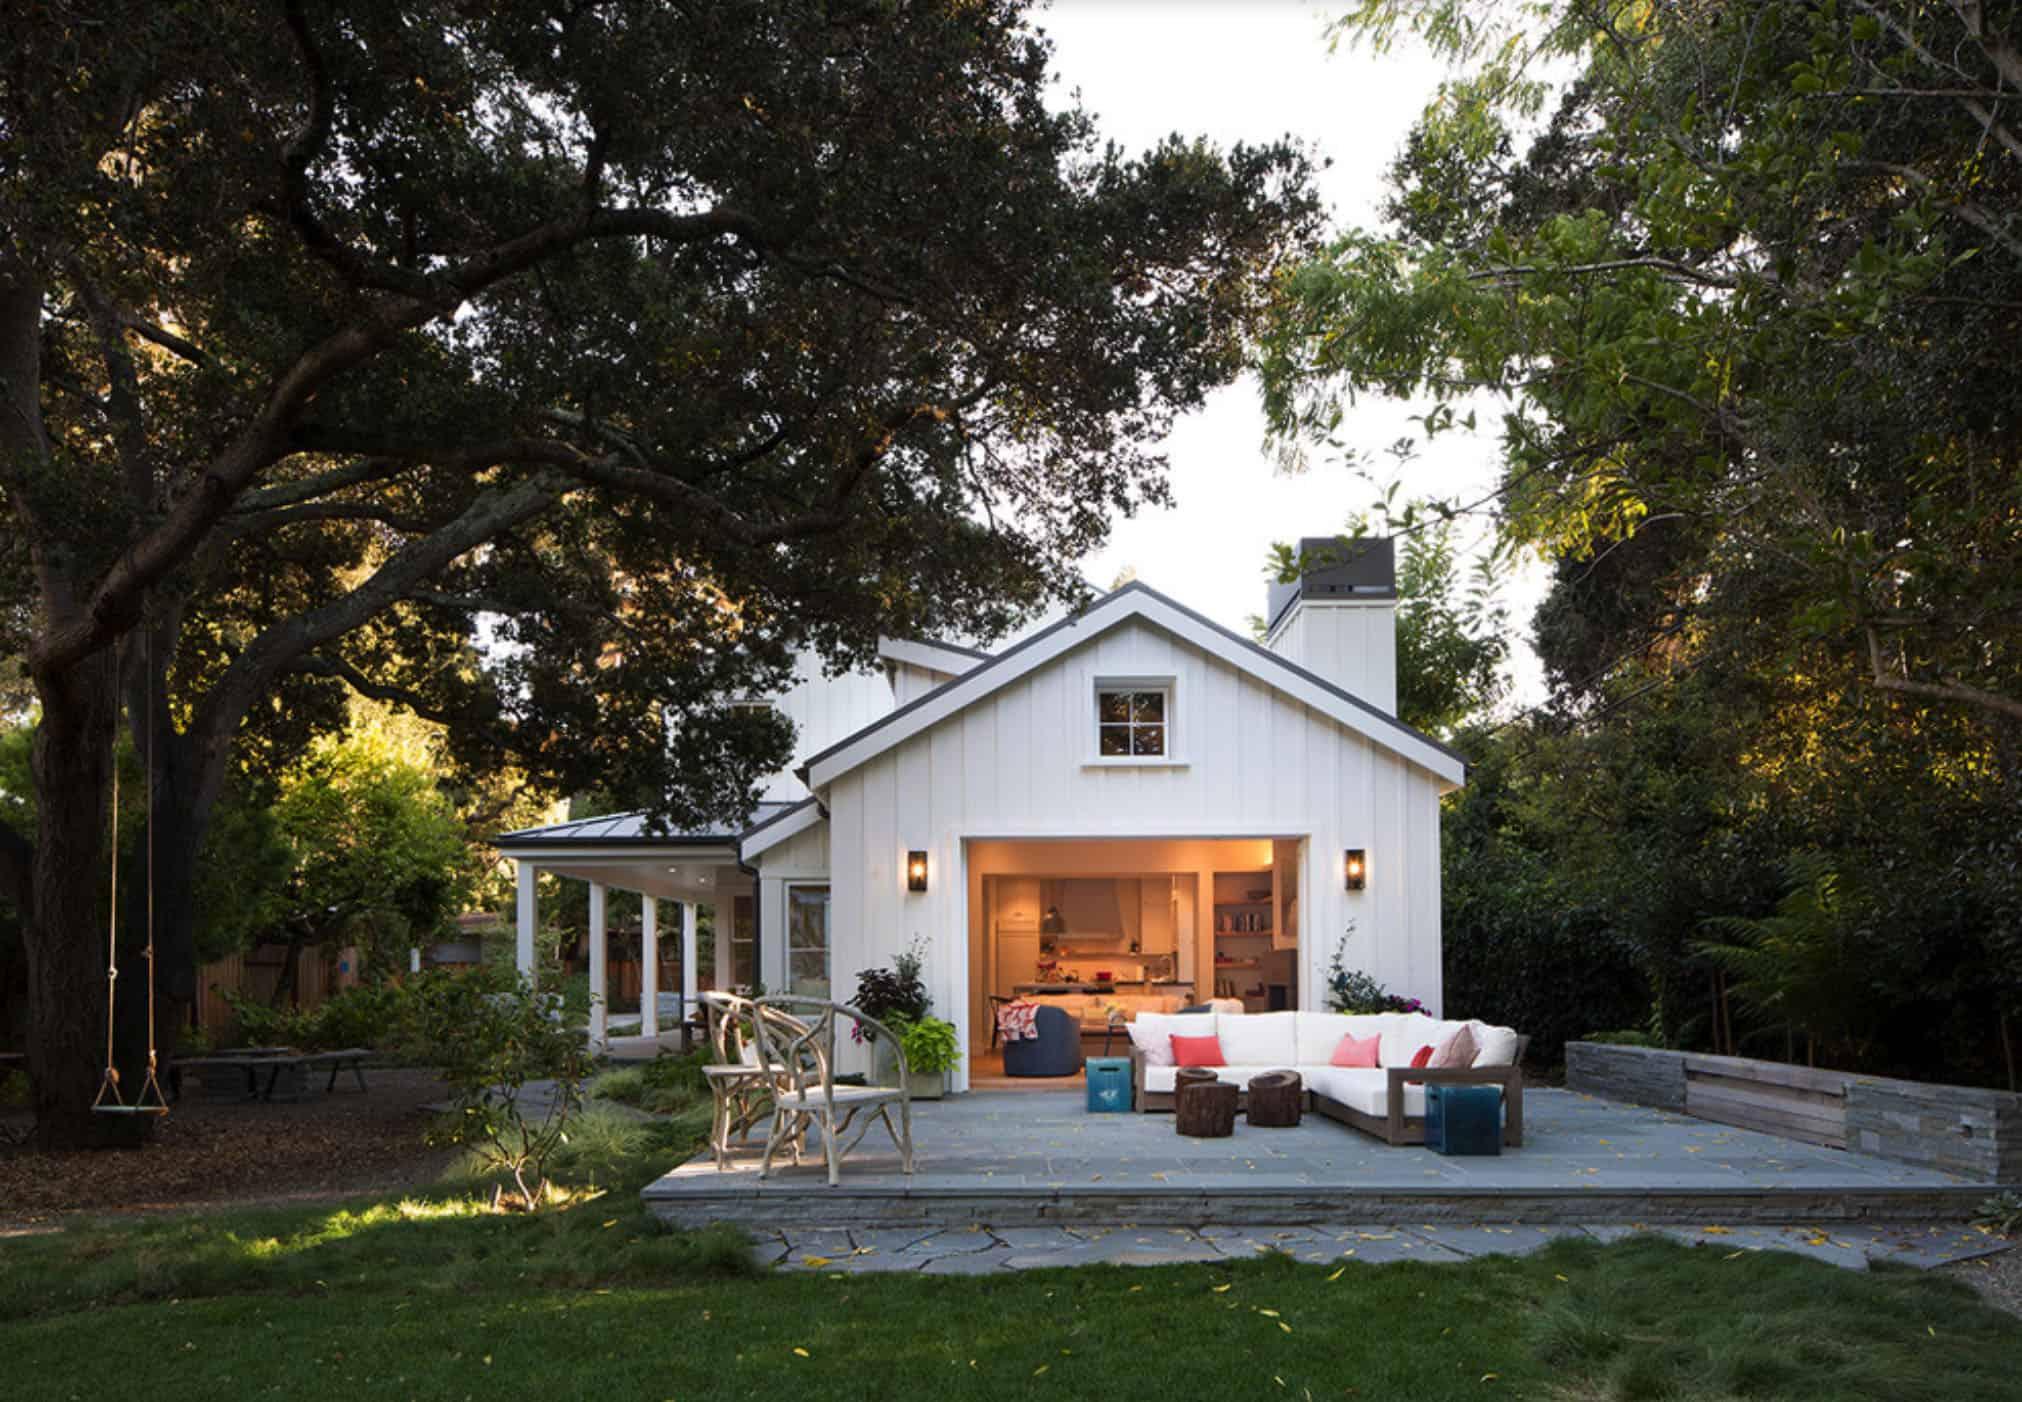 residence-farmhouse-patio